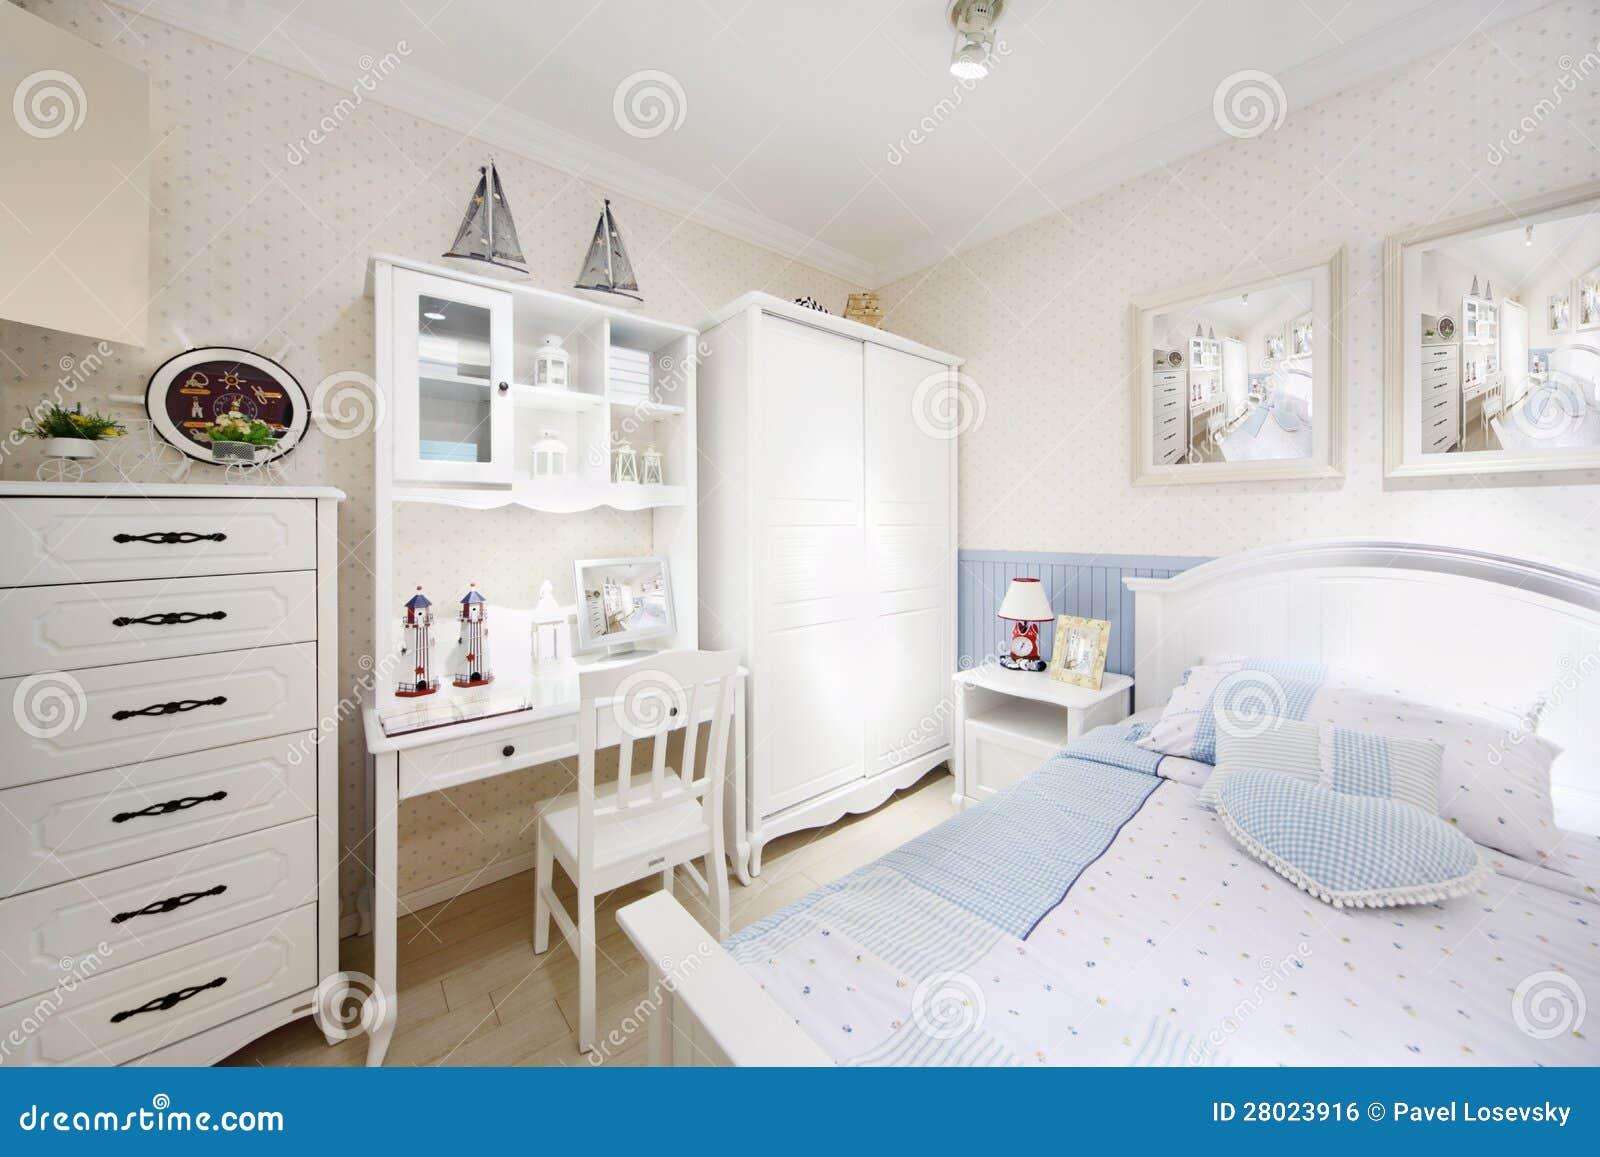 Stylish white bedroom with big bed, wardrobe